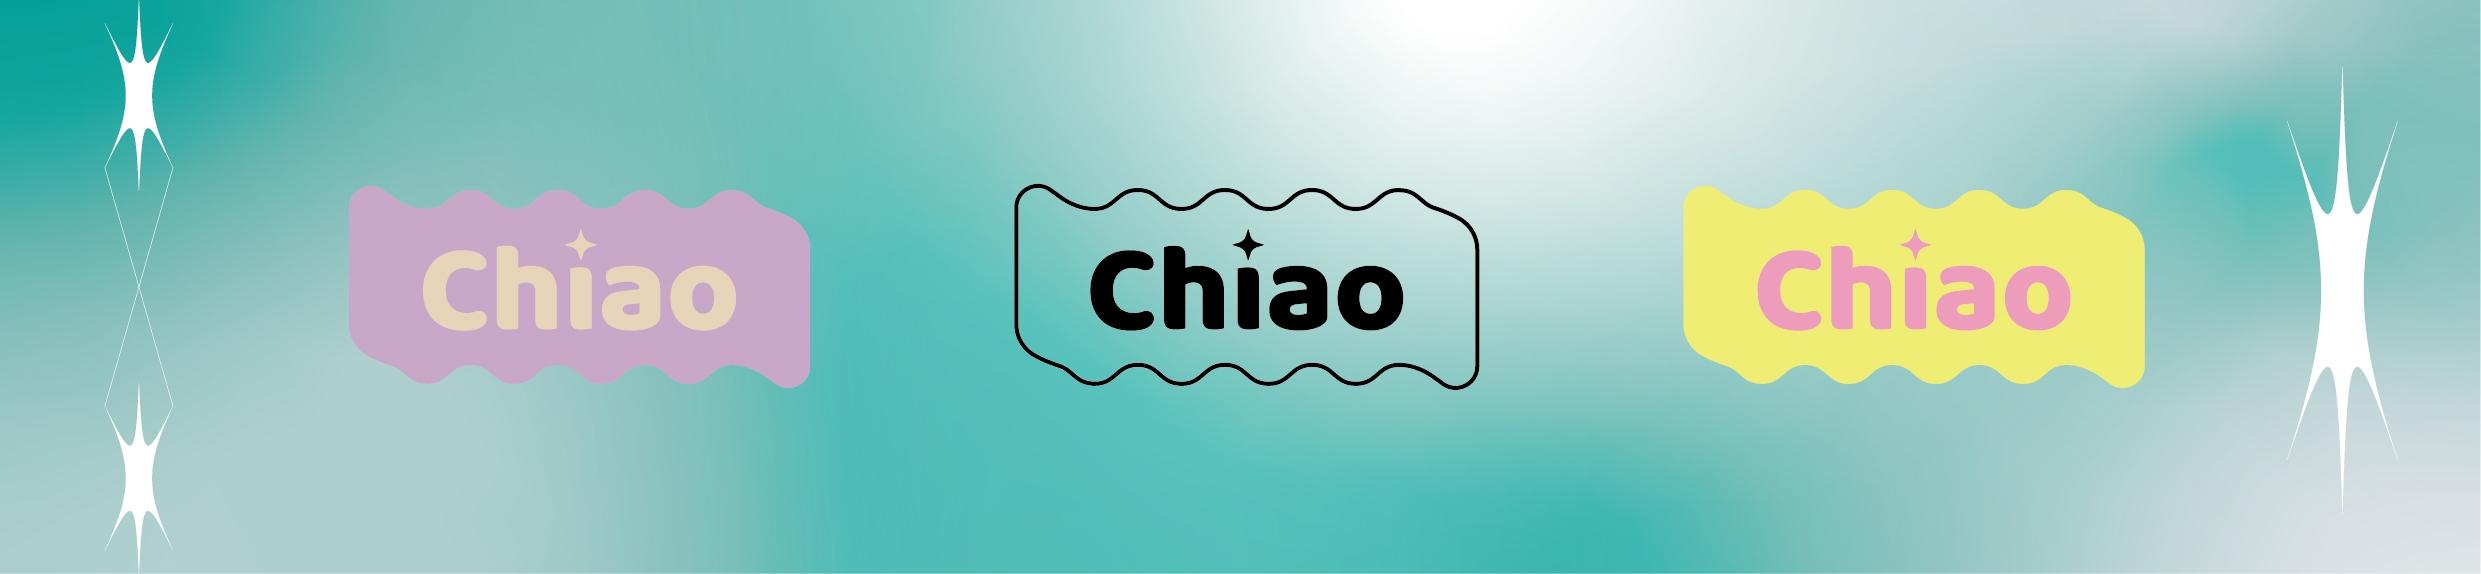 c (@chiaoyyyyy) Cover Image